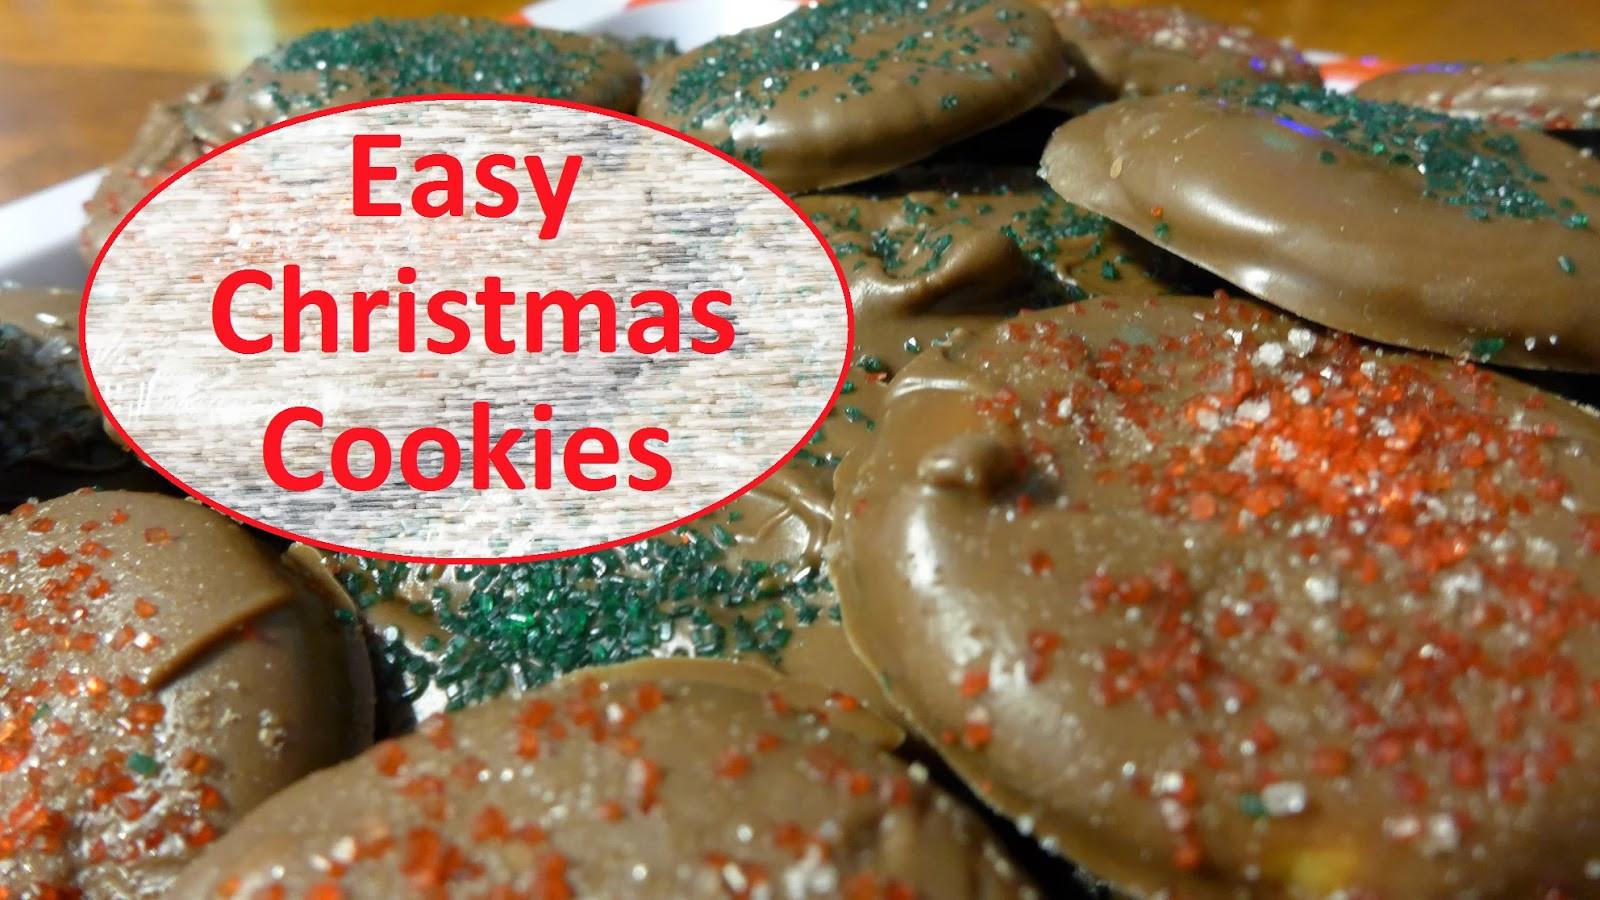 Easy Christmas Cookies To Make  EasyMeWorld How To Make Easy Christmas Cookies